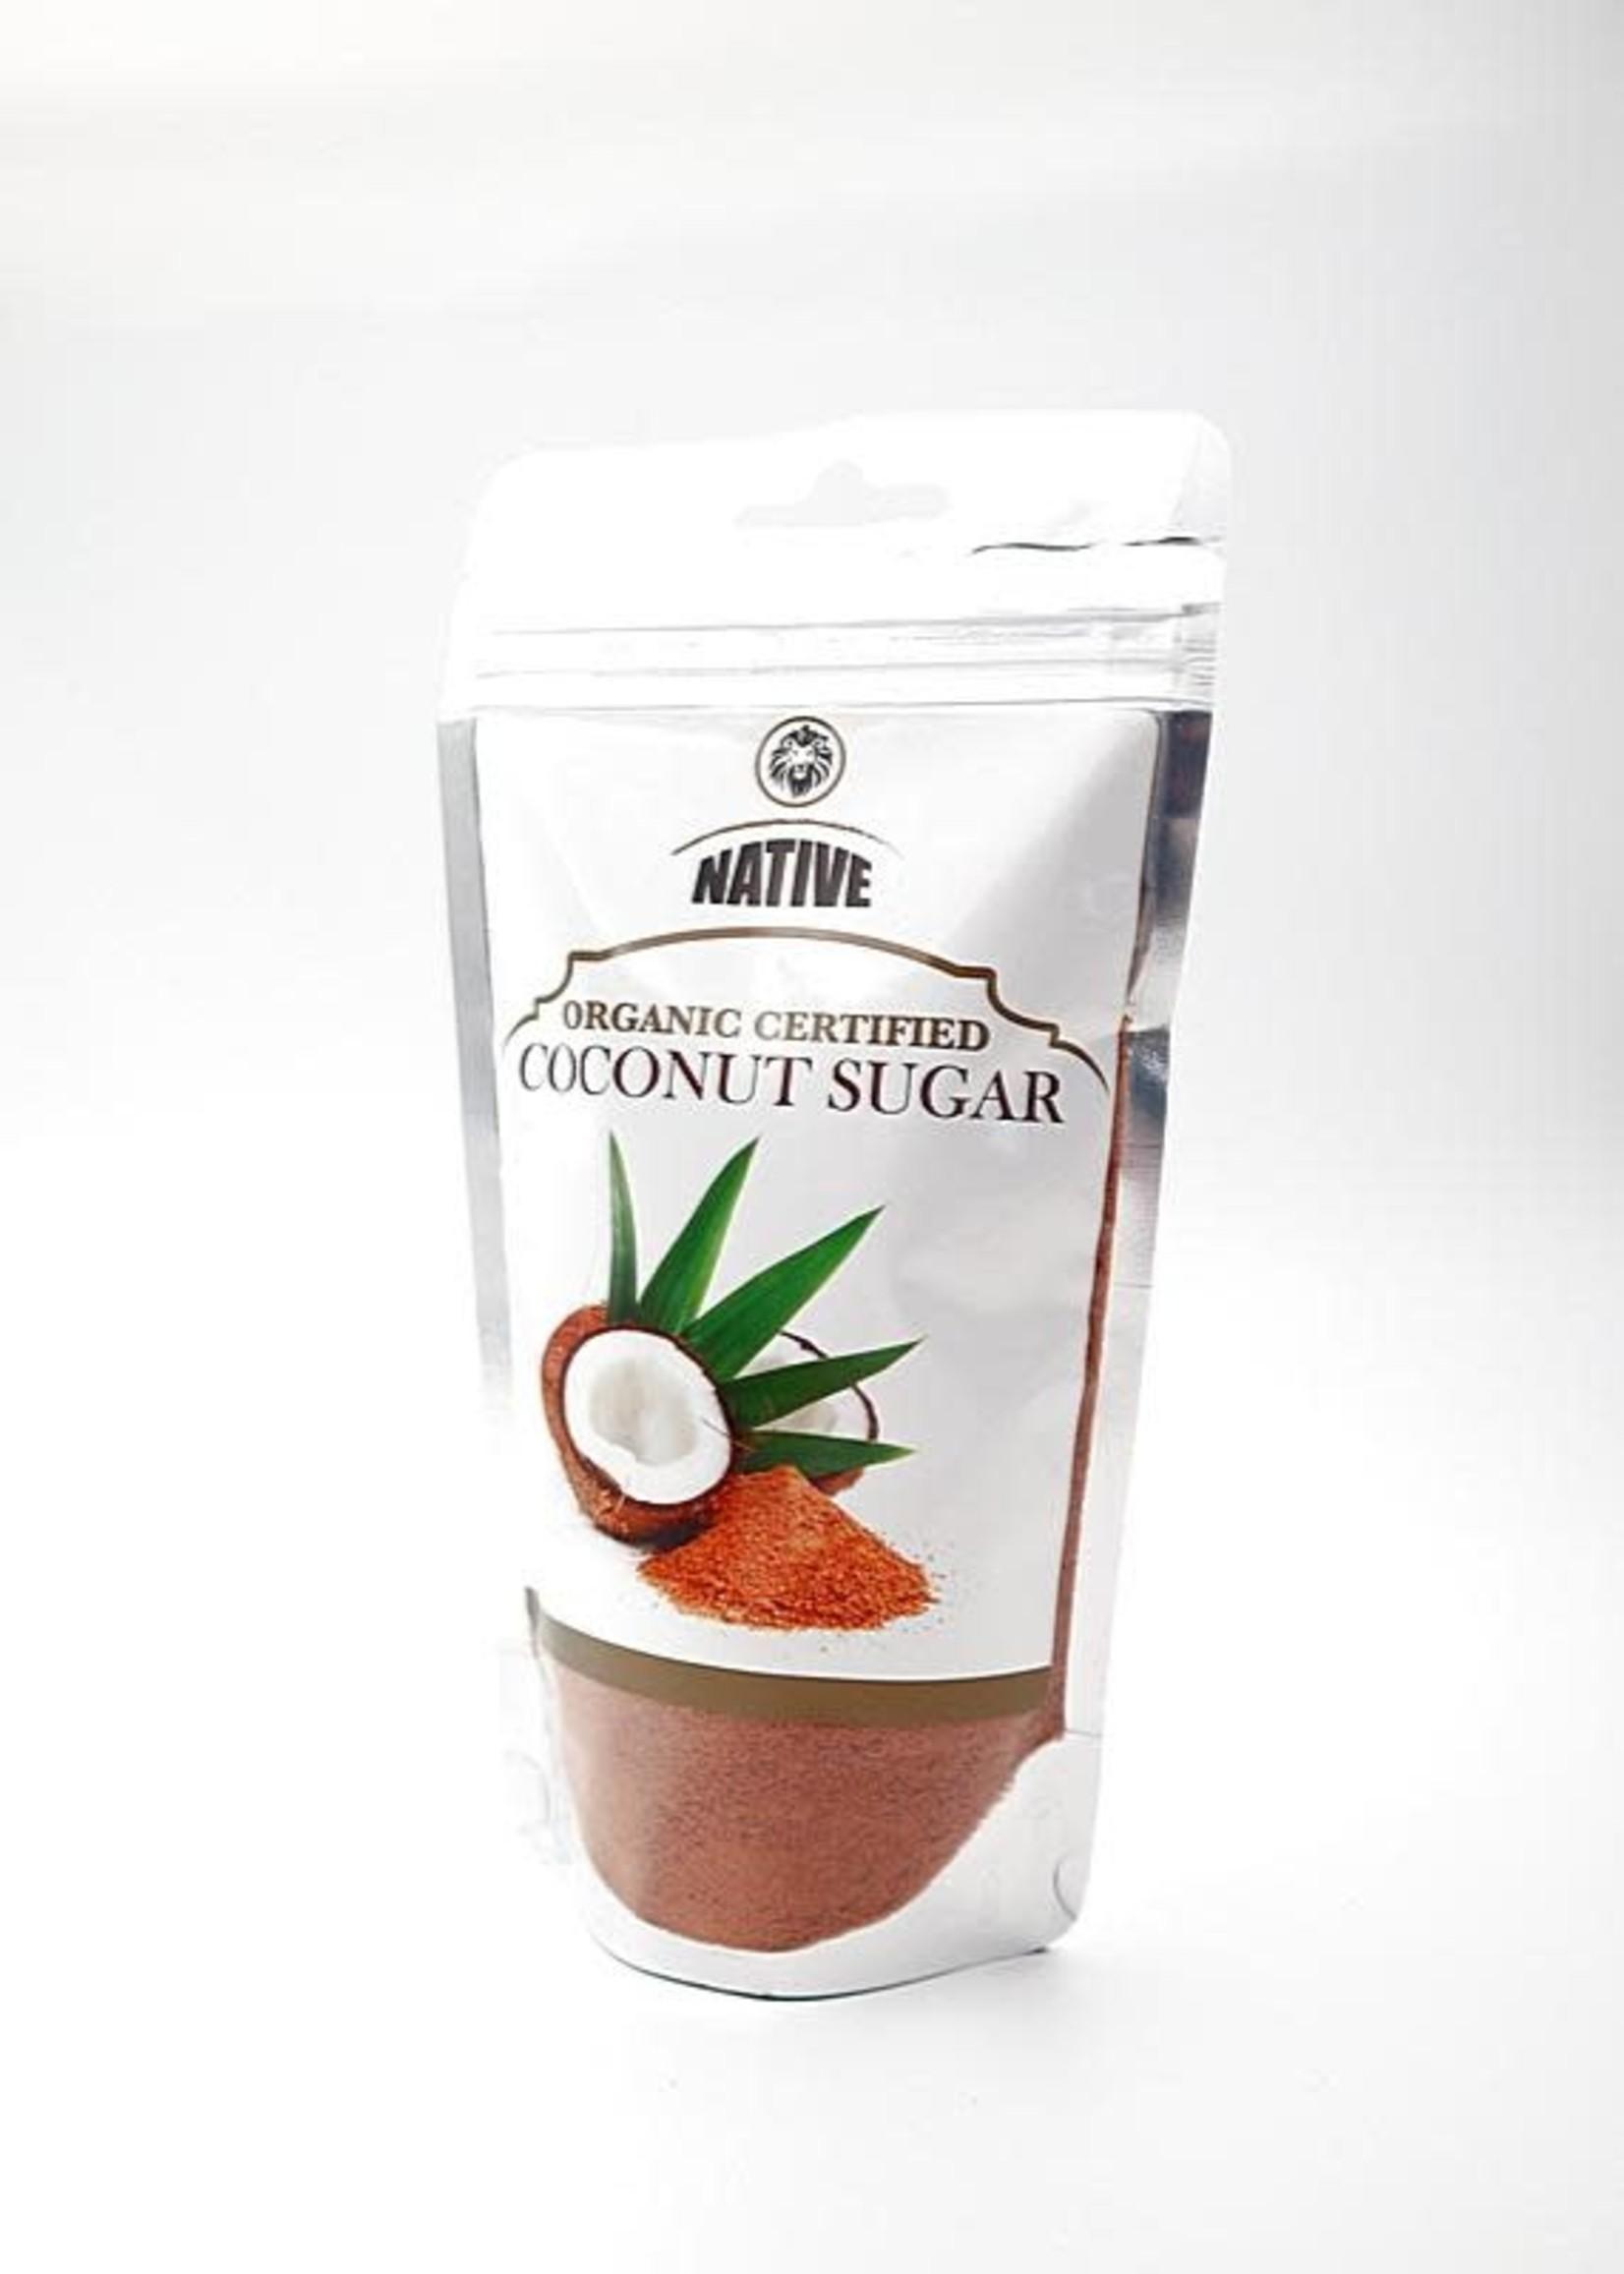 Native Native - Organic Coconut Sugar 300g